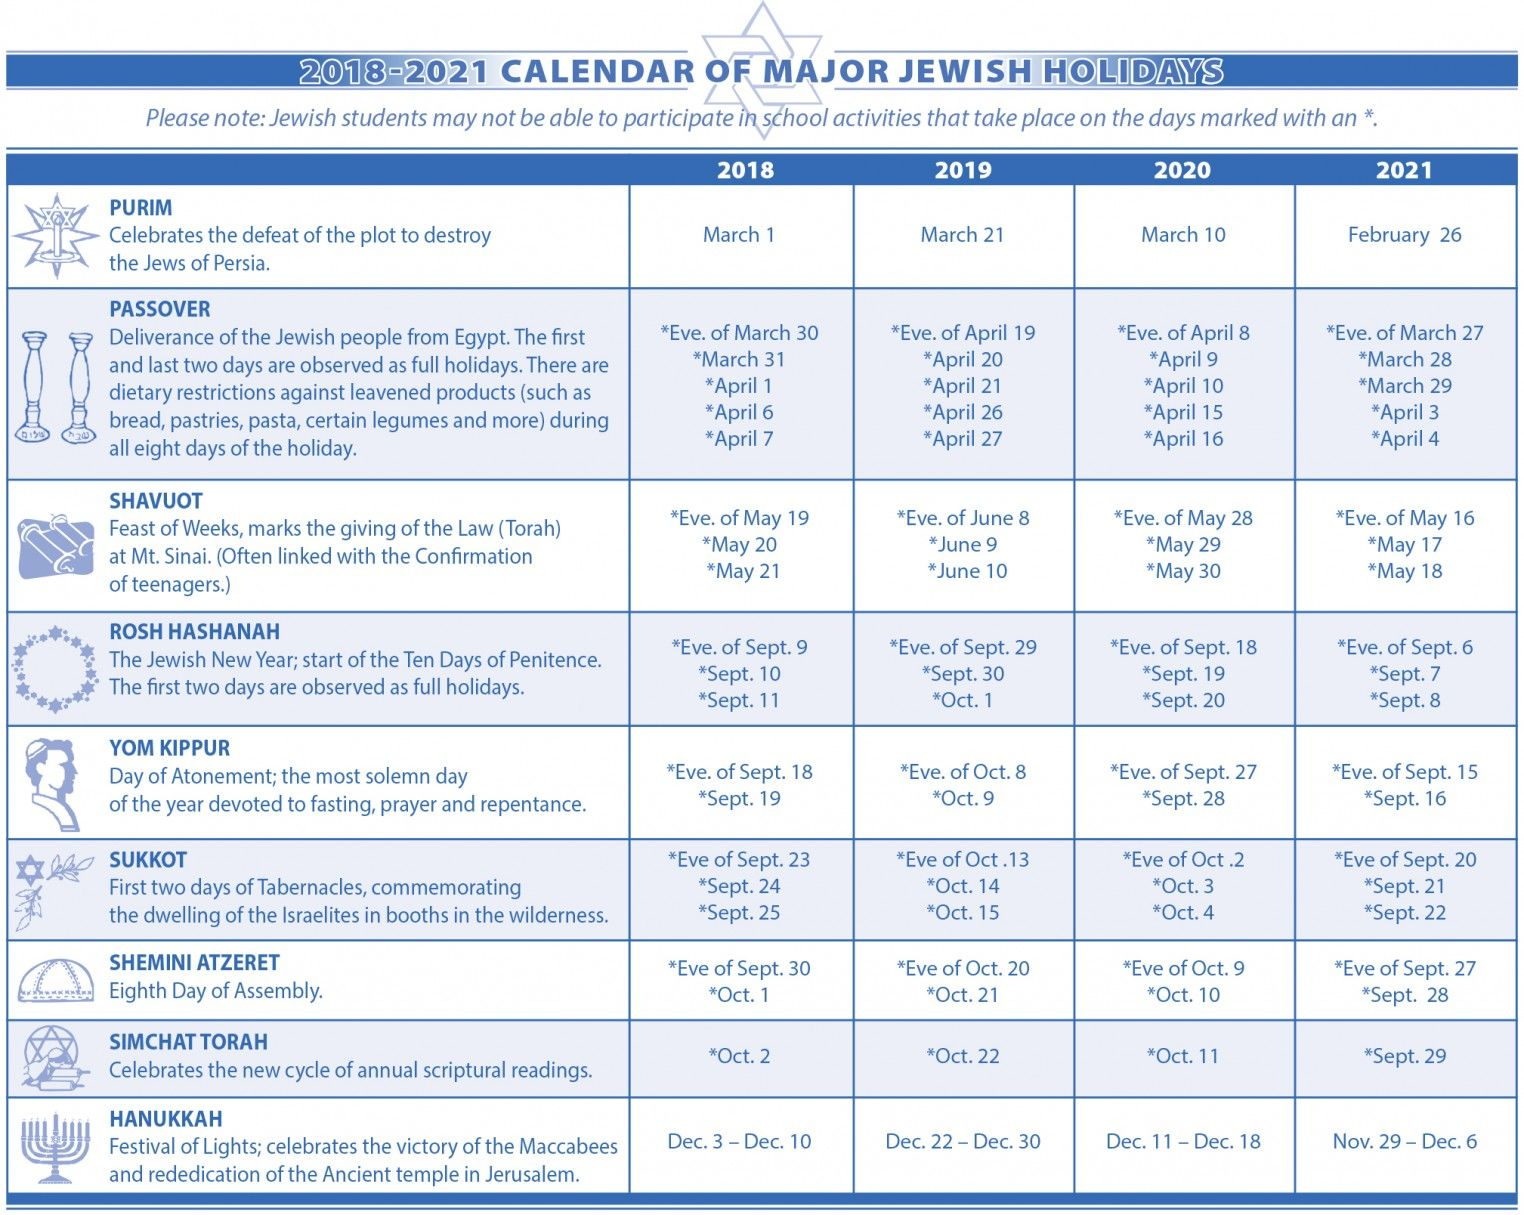 2021 Jewish Holiday Calendar Jewish Holidays | The Jewish Federation of Sarasota Manatee